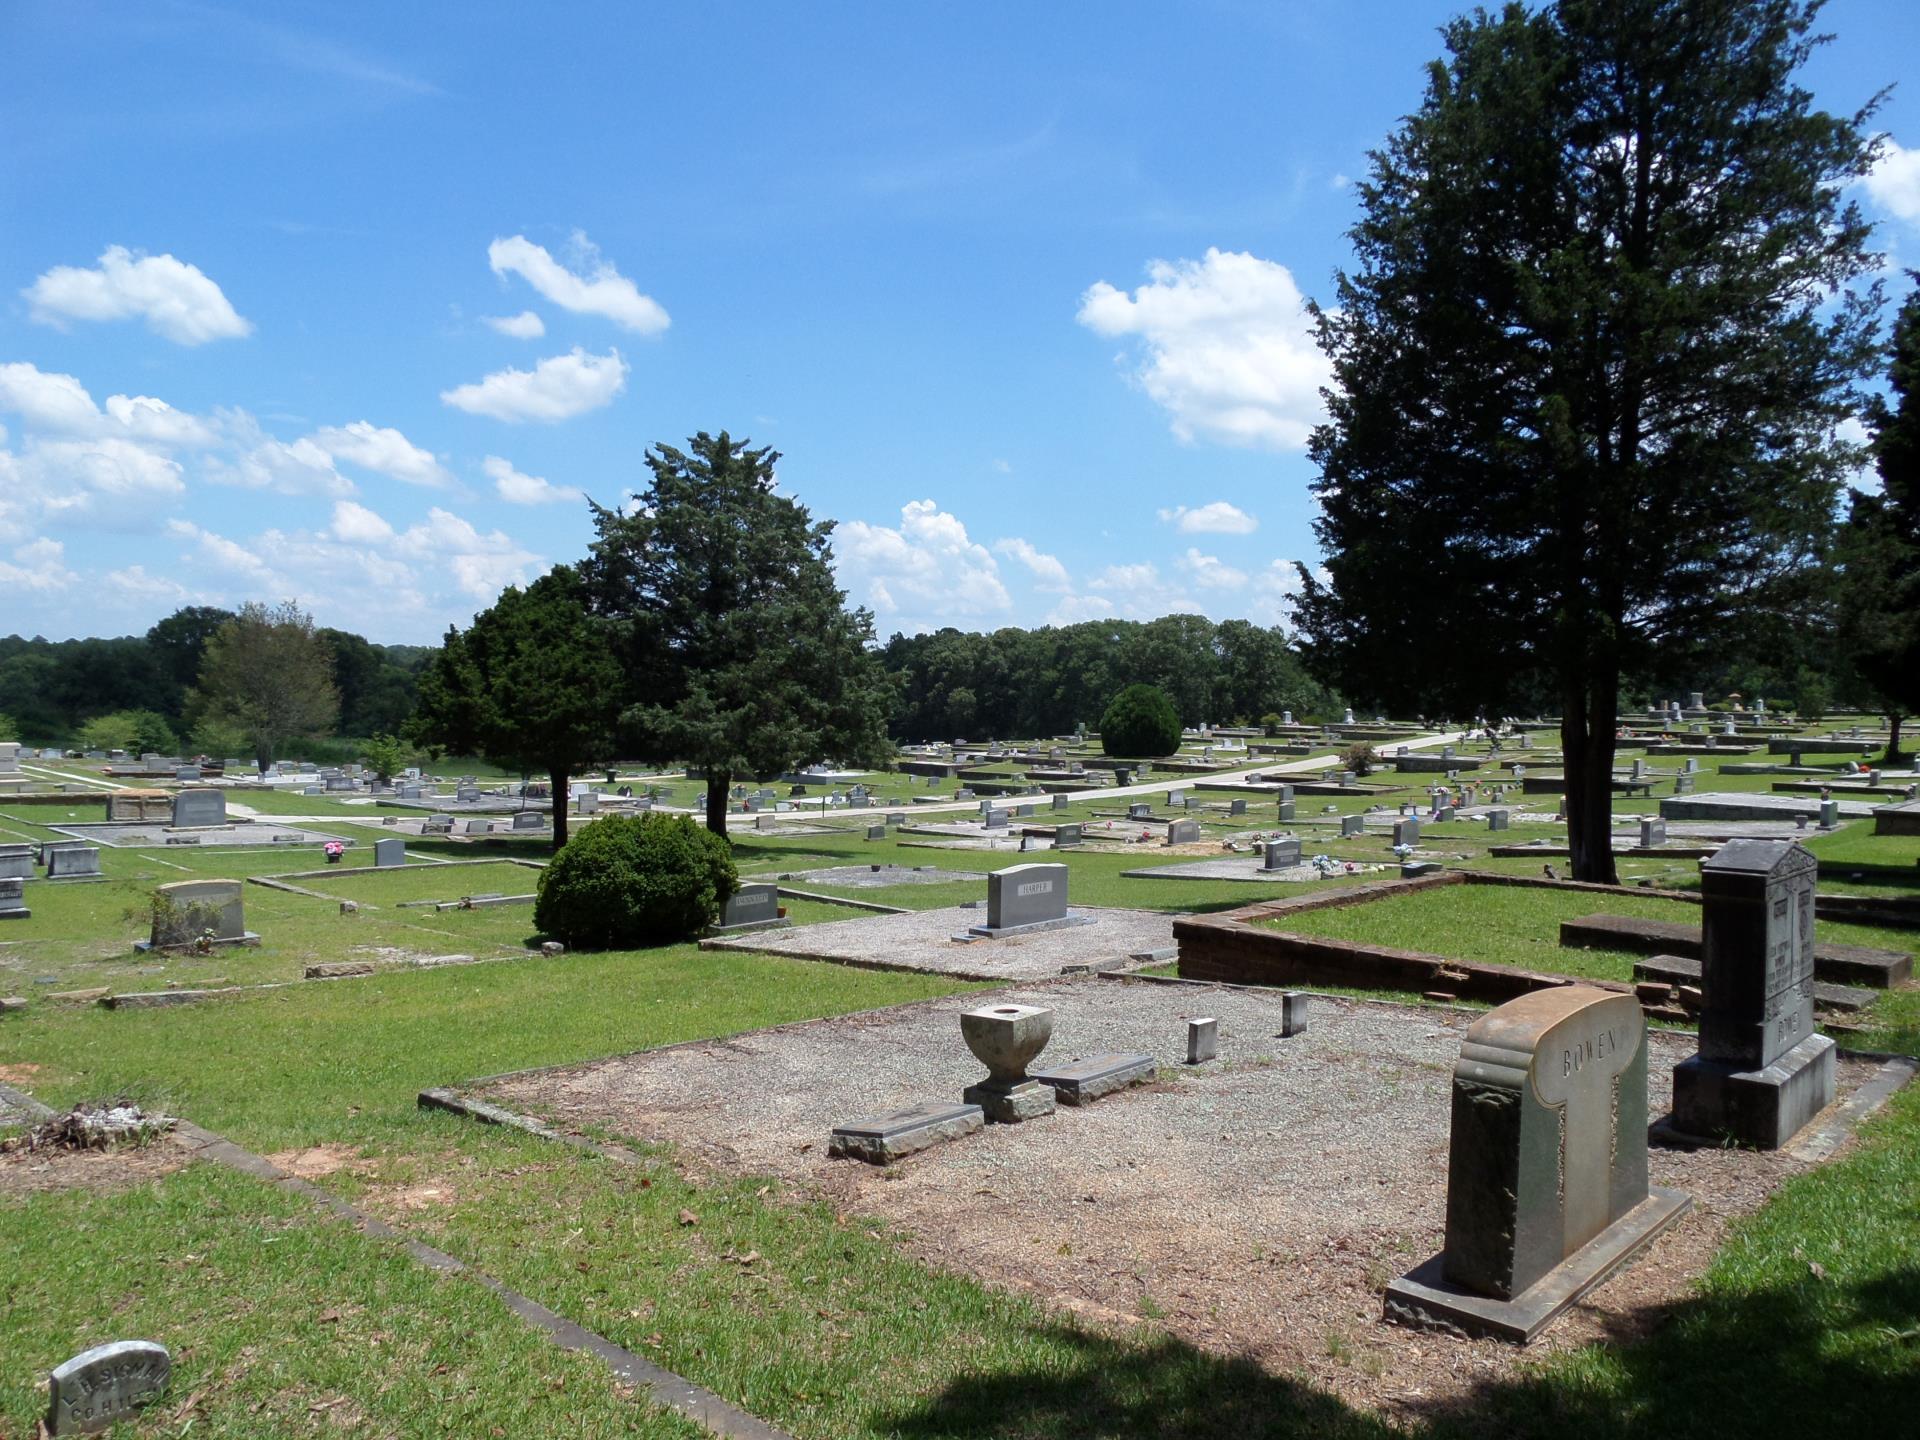 East View Cemetery Gravesites | City of Conyers, GA